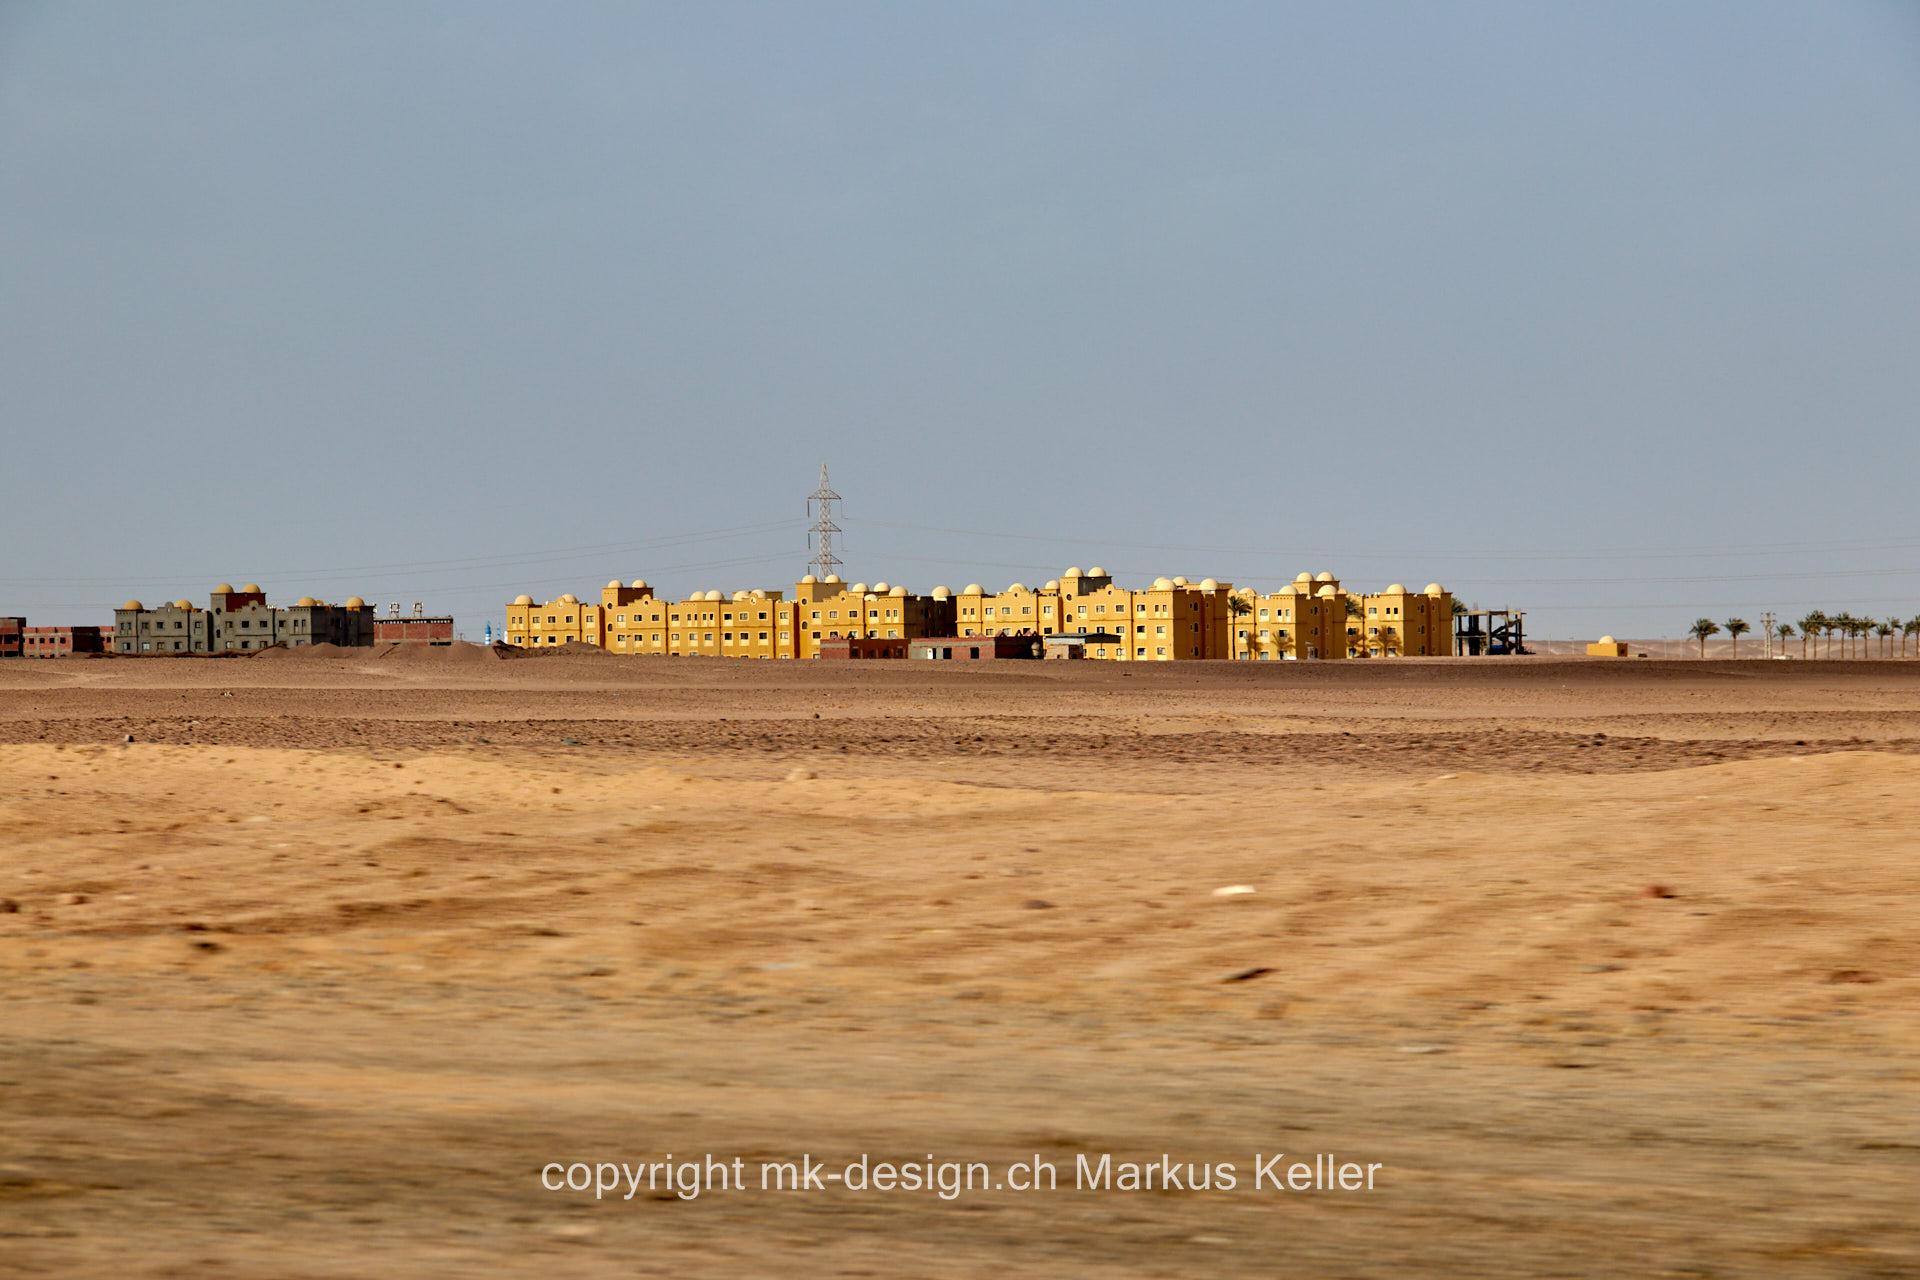 Wüste   Bauwerk   Haus